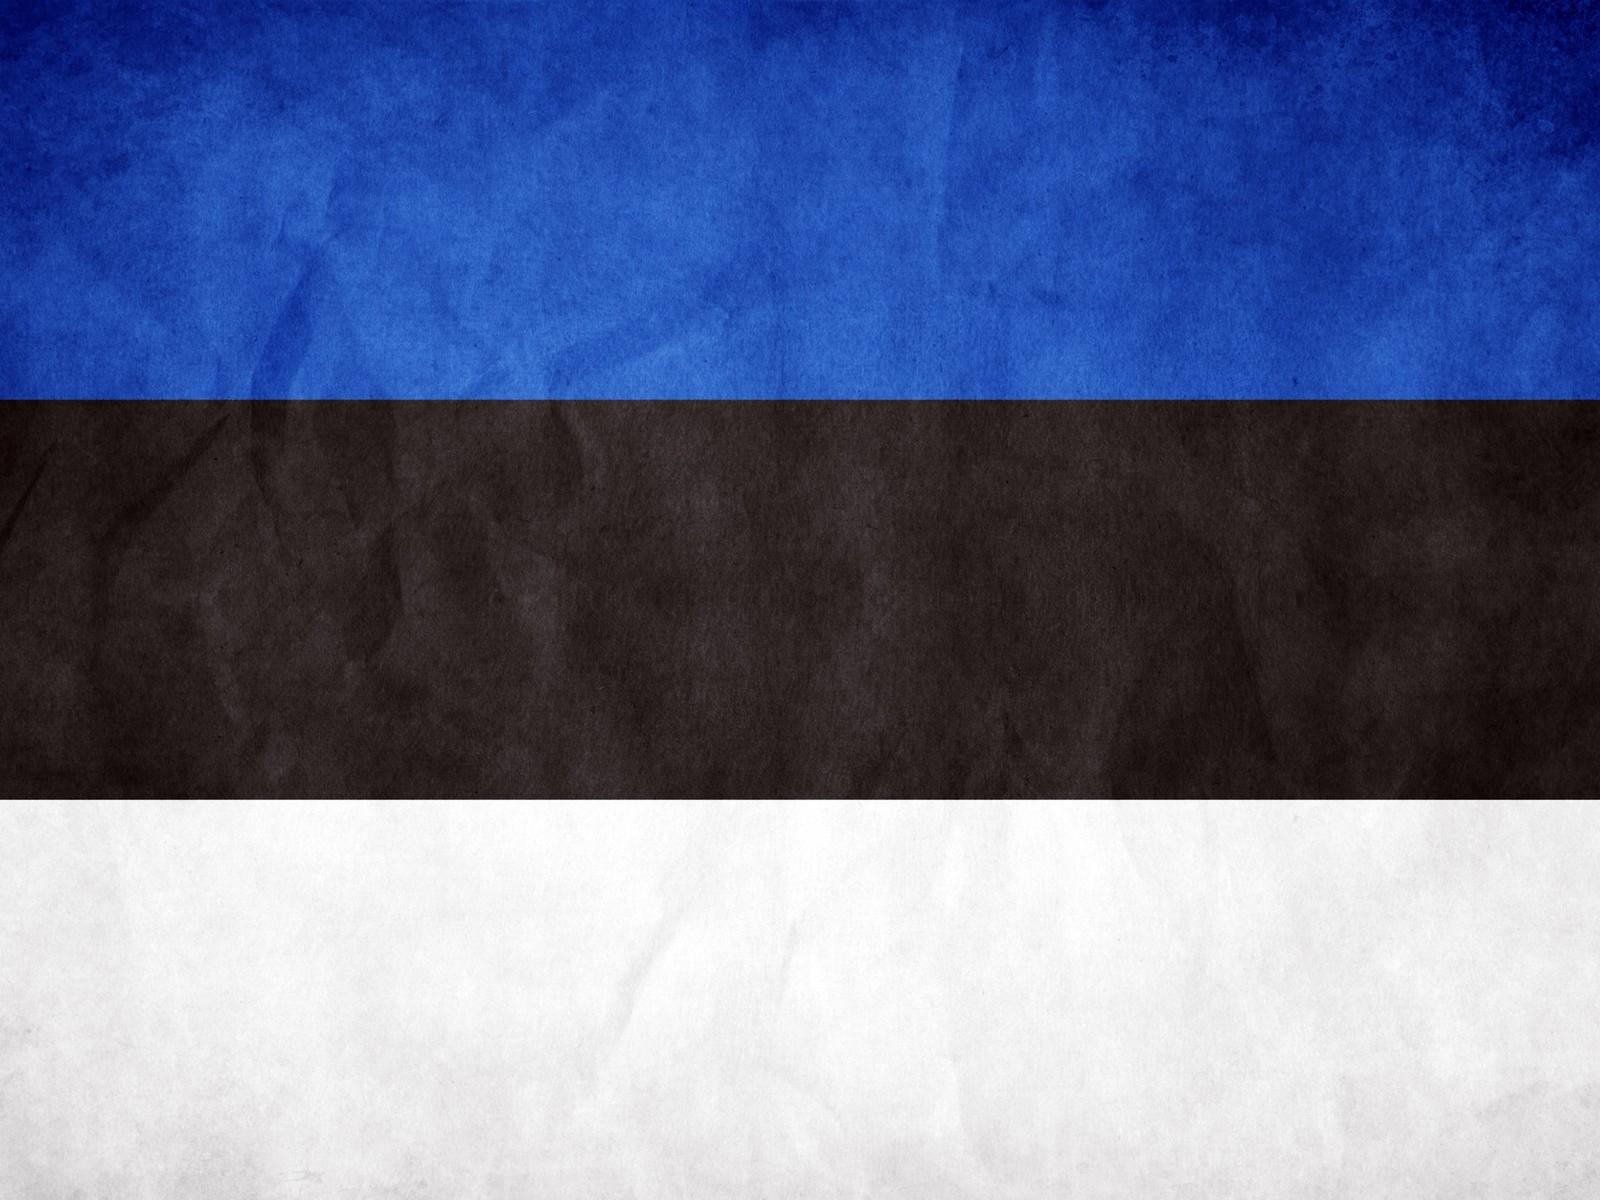 Estonia flag wallpaper 9784 PC en 1600x1200